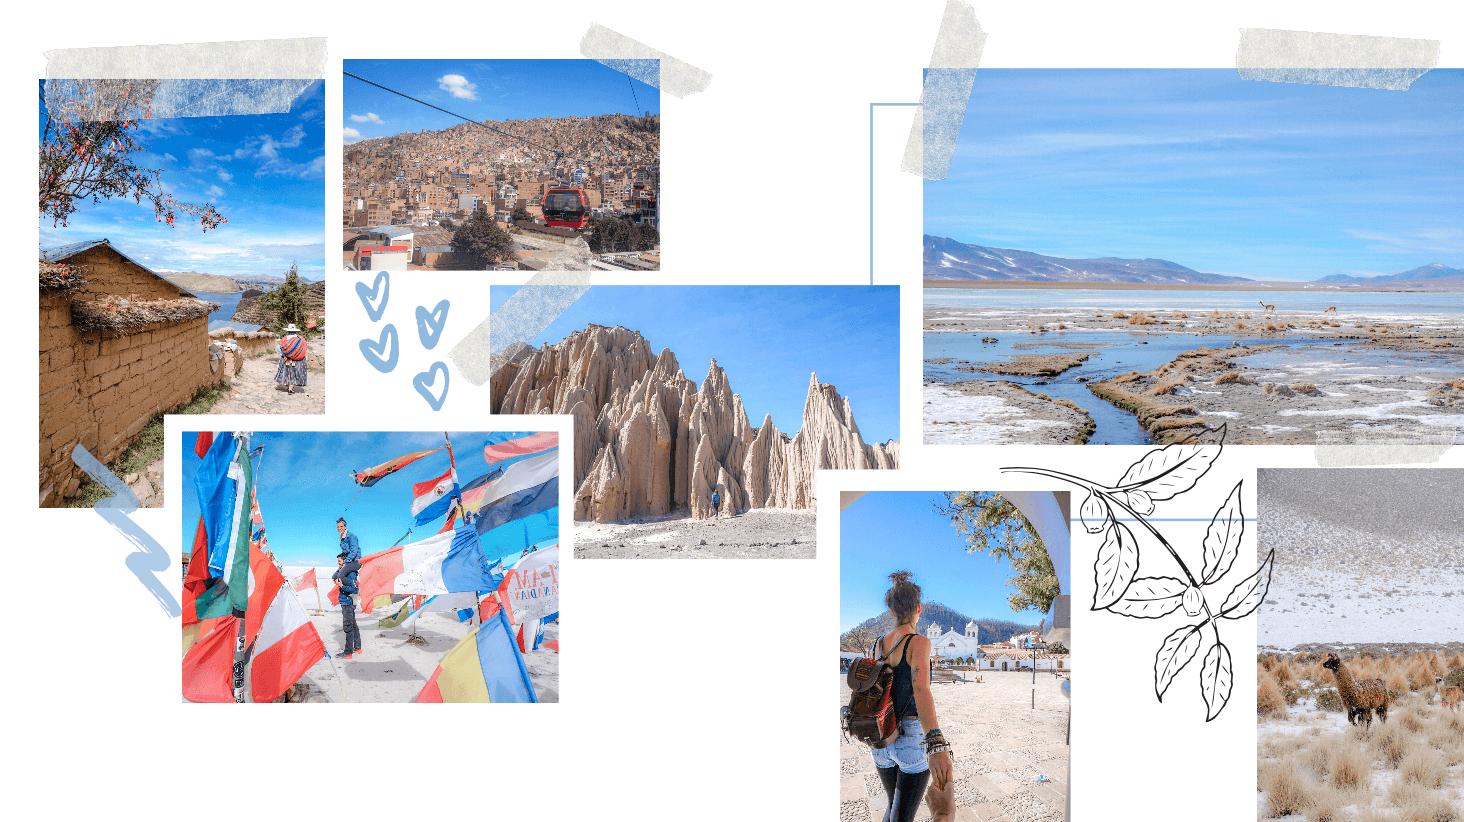 visiter la bolivie voyage